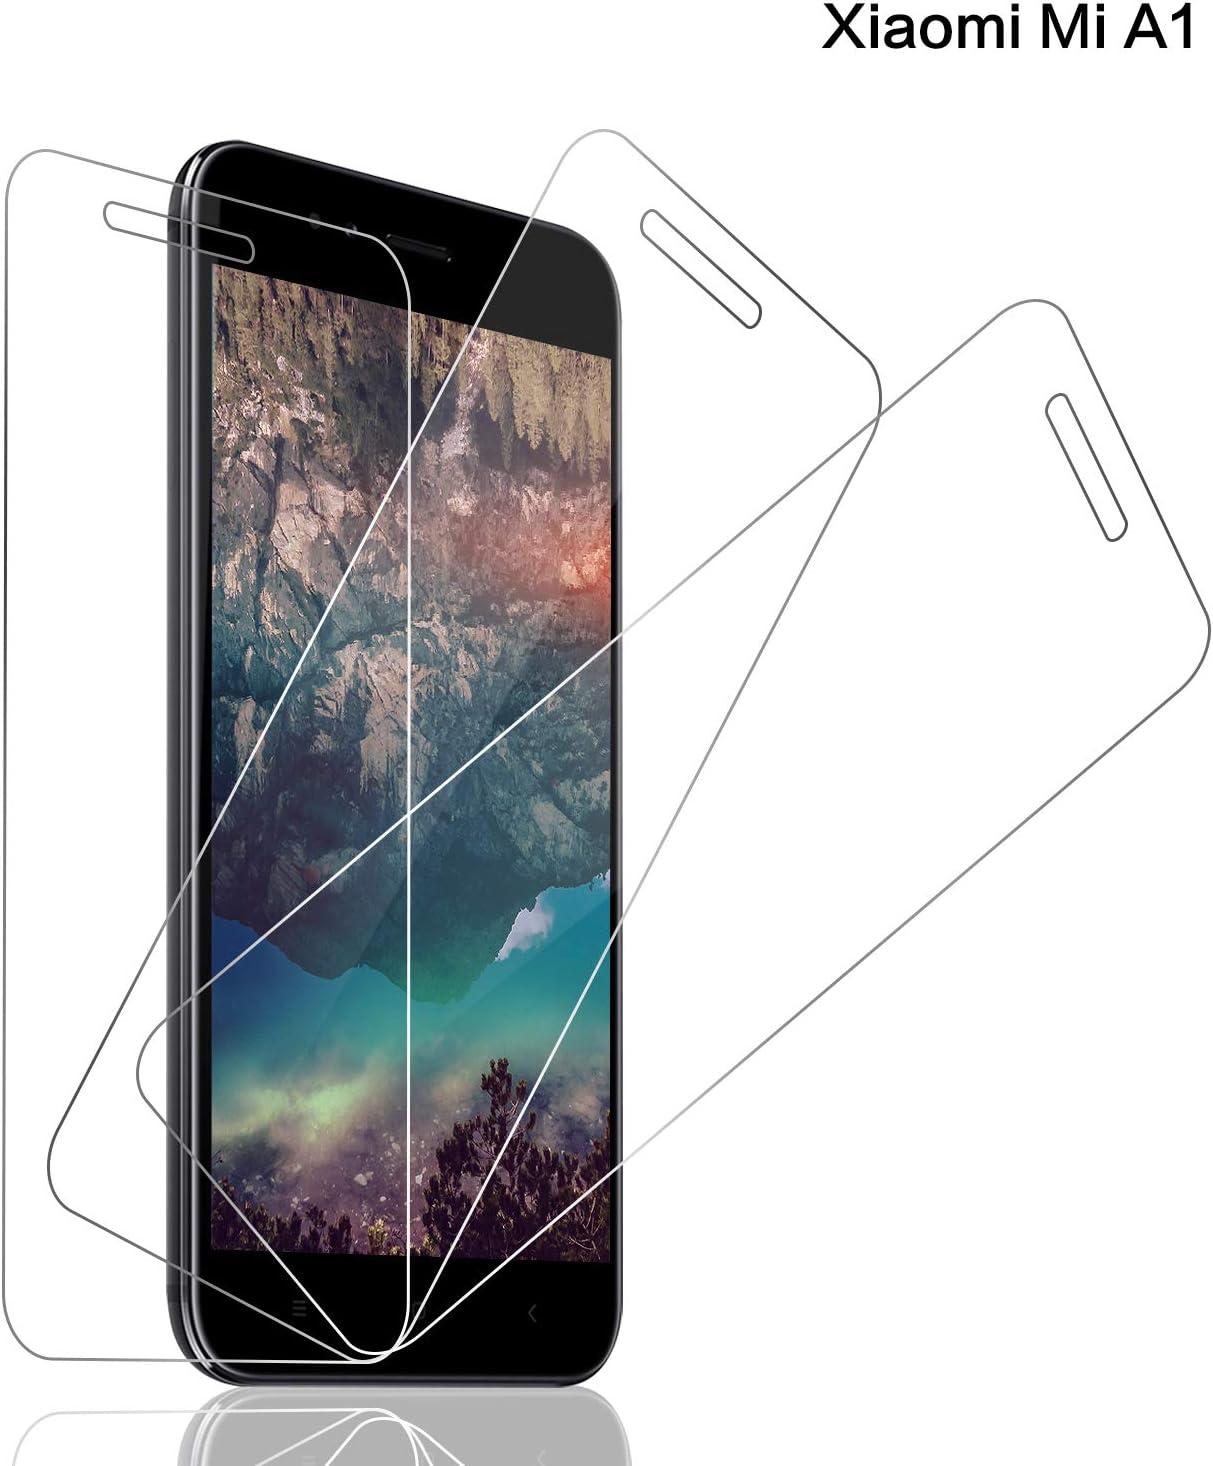 SNUNGPHIR® Cristal Templado Xiaomi Mi A1, [3-Pack] Protector ...